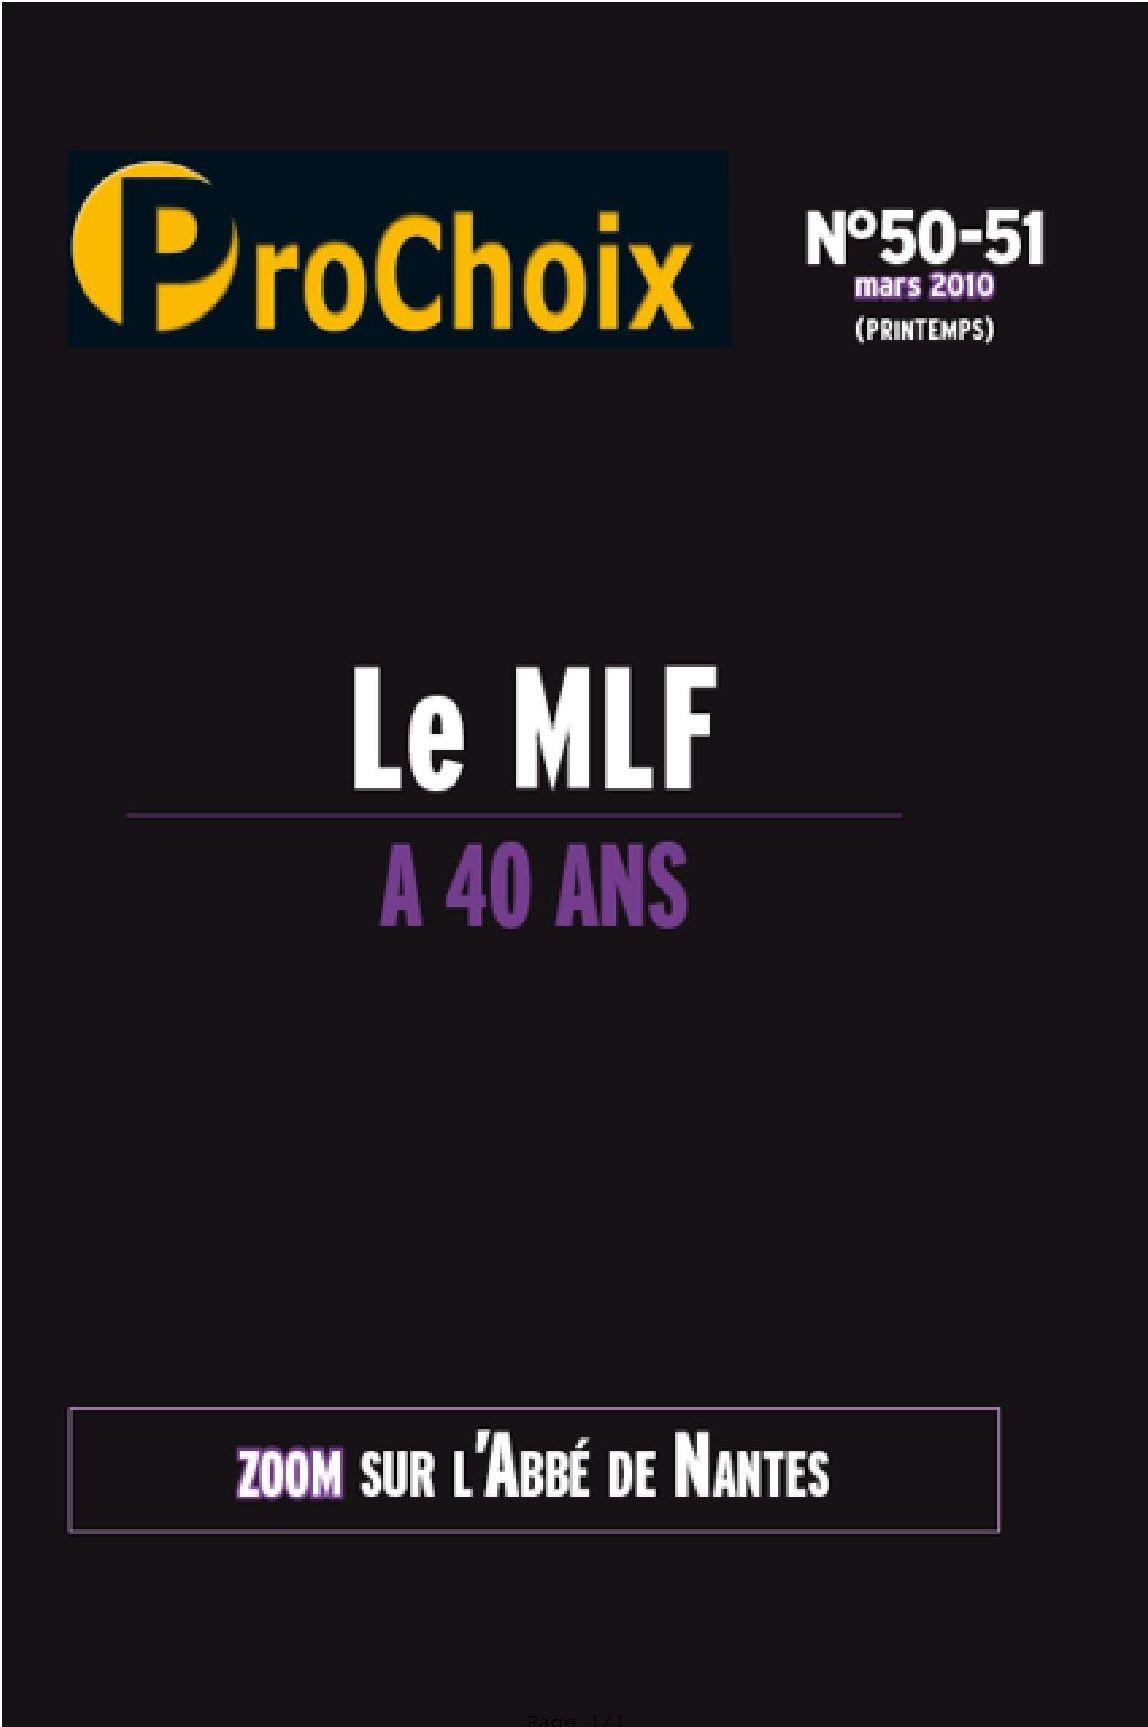 PROCHOIX N 50-51 : LE MLF A 40 ANS